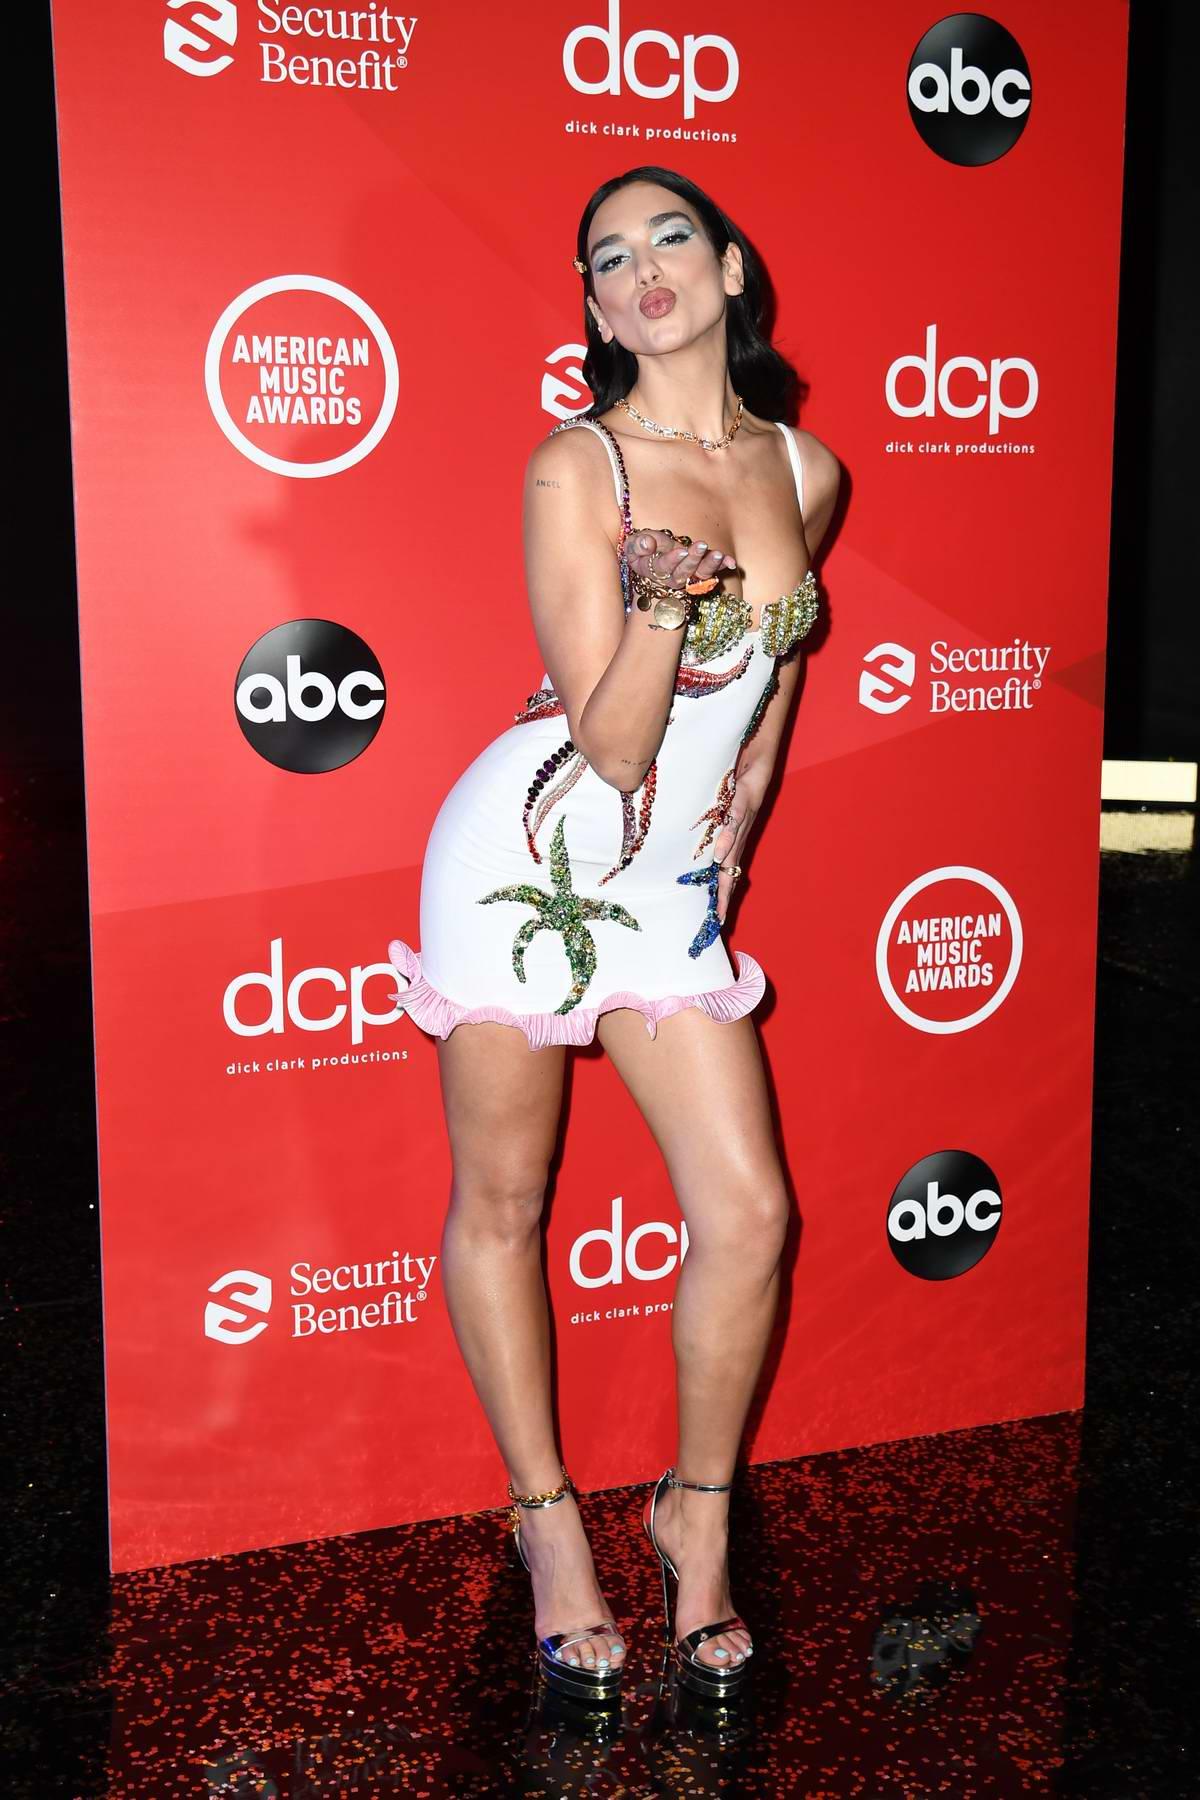 Dua Lipa attends the 2020 American Music Awards in London, UK